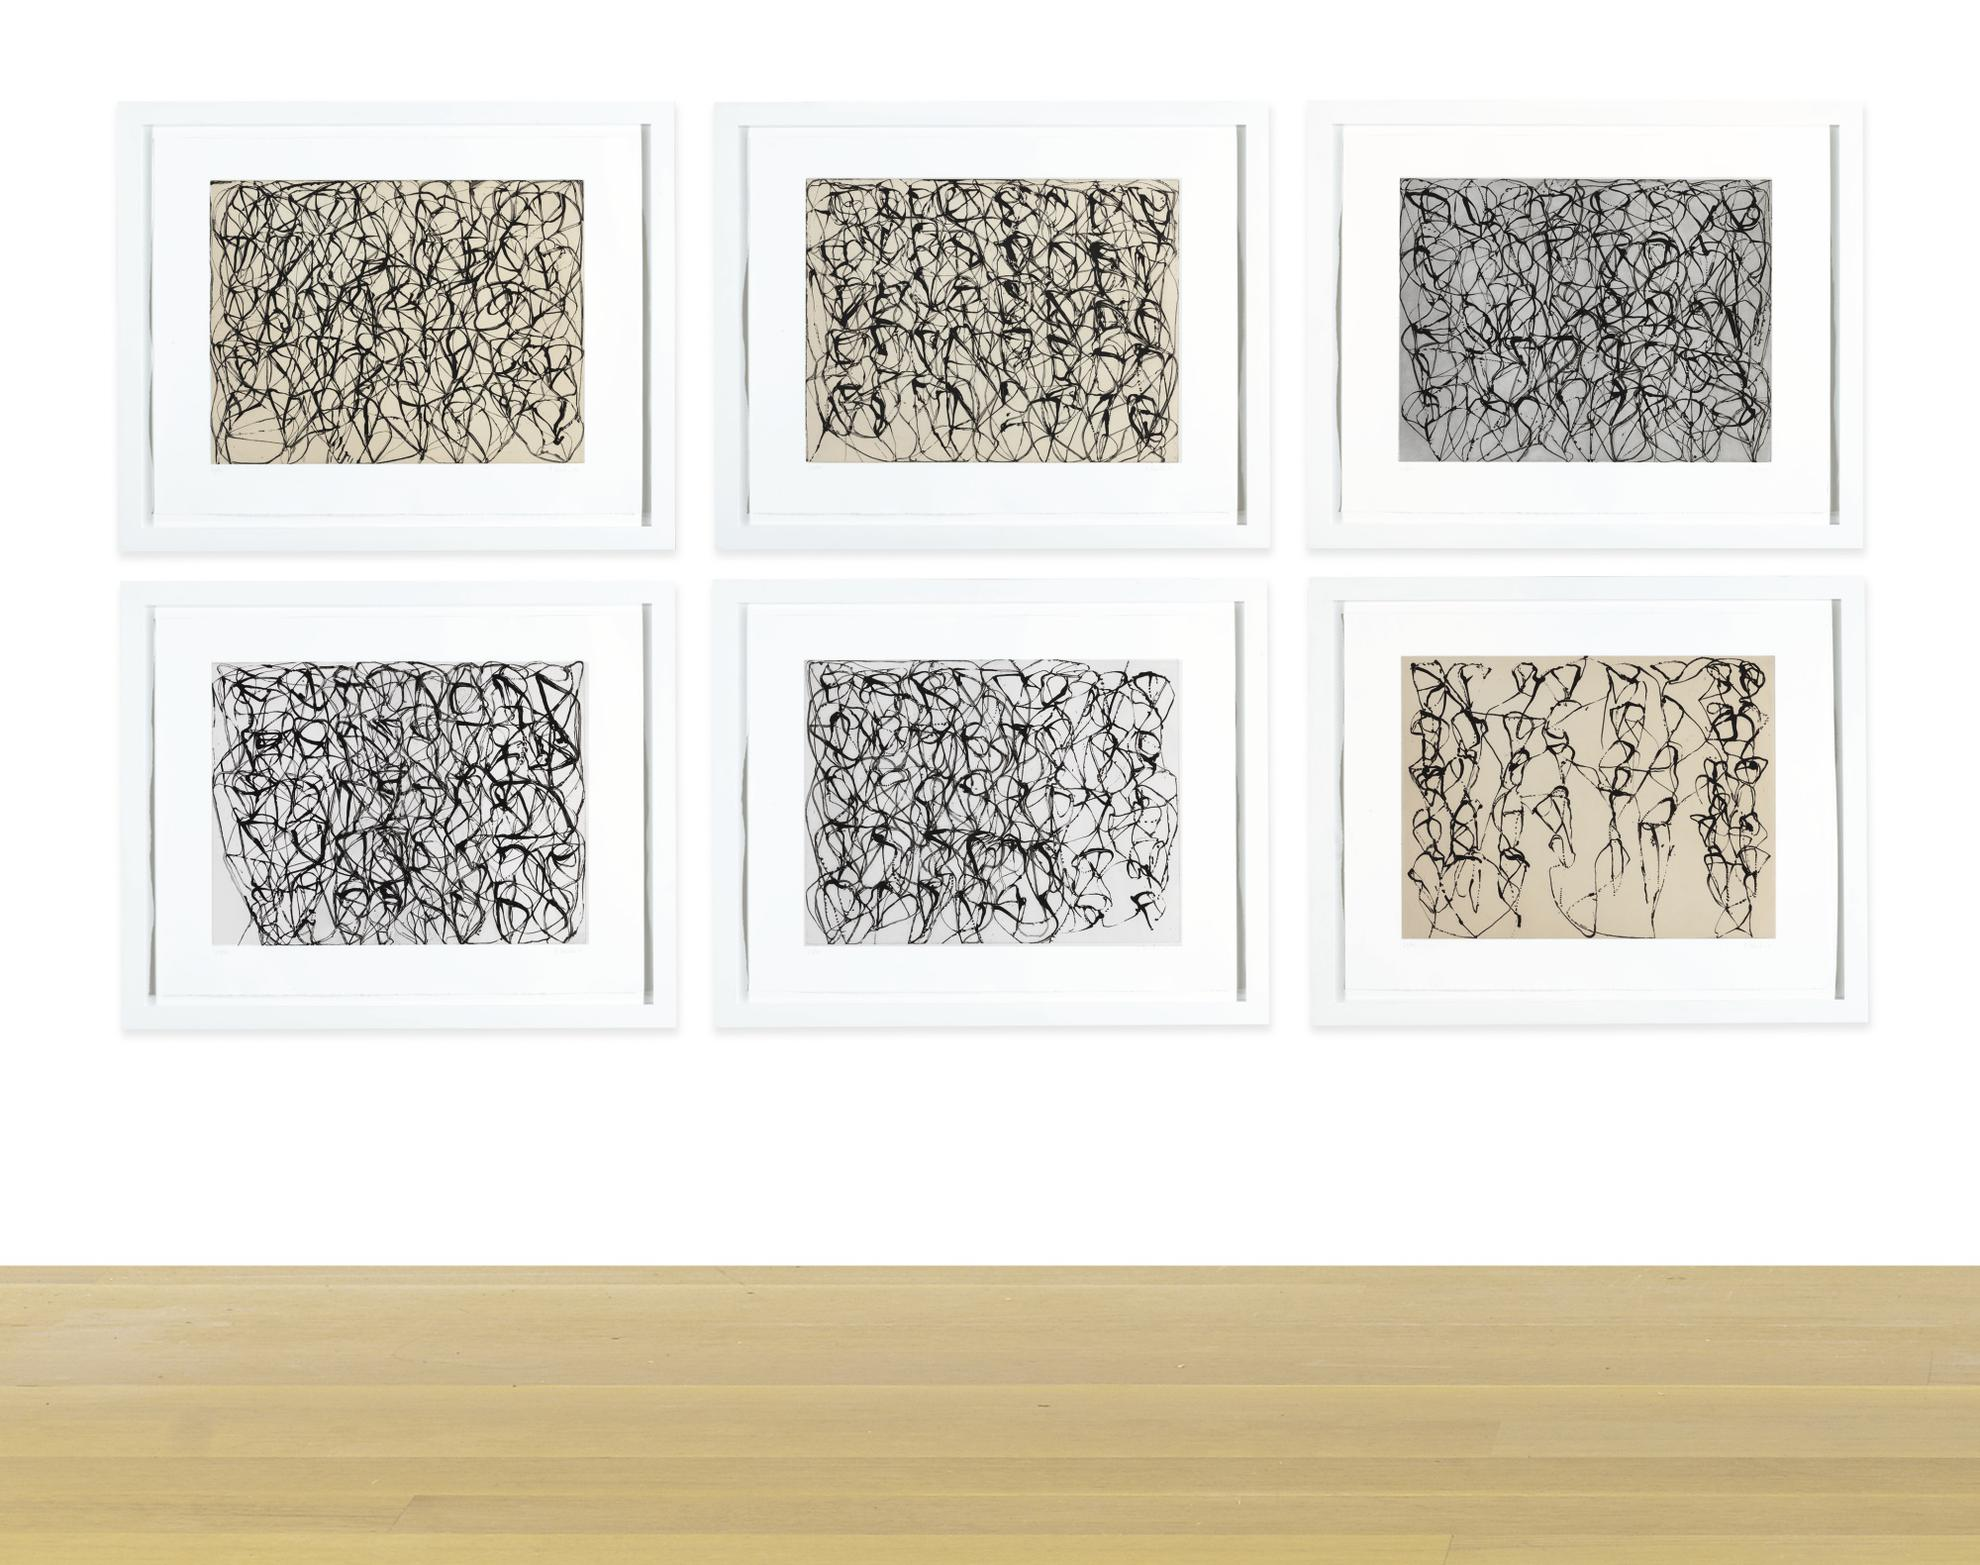 Brice Marden-Cold Mountain Series, Zen Study 1-6-1991